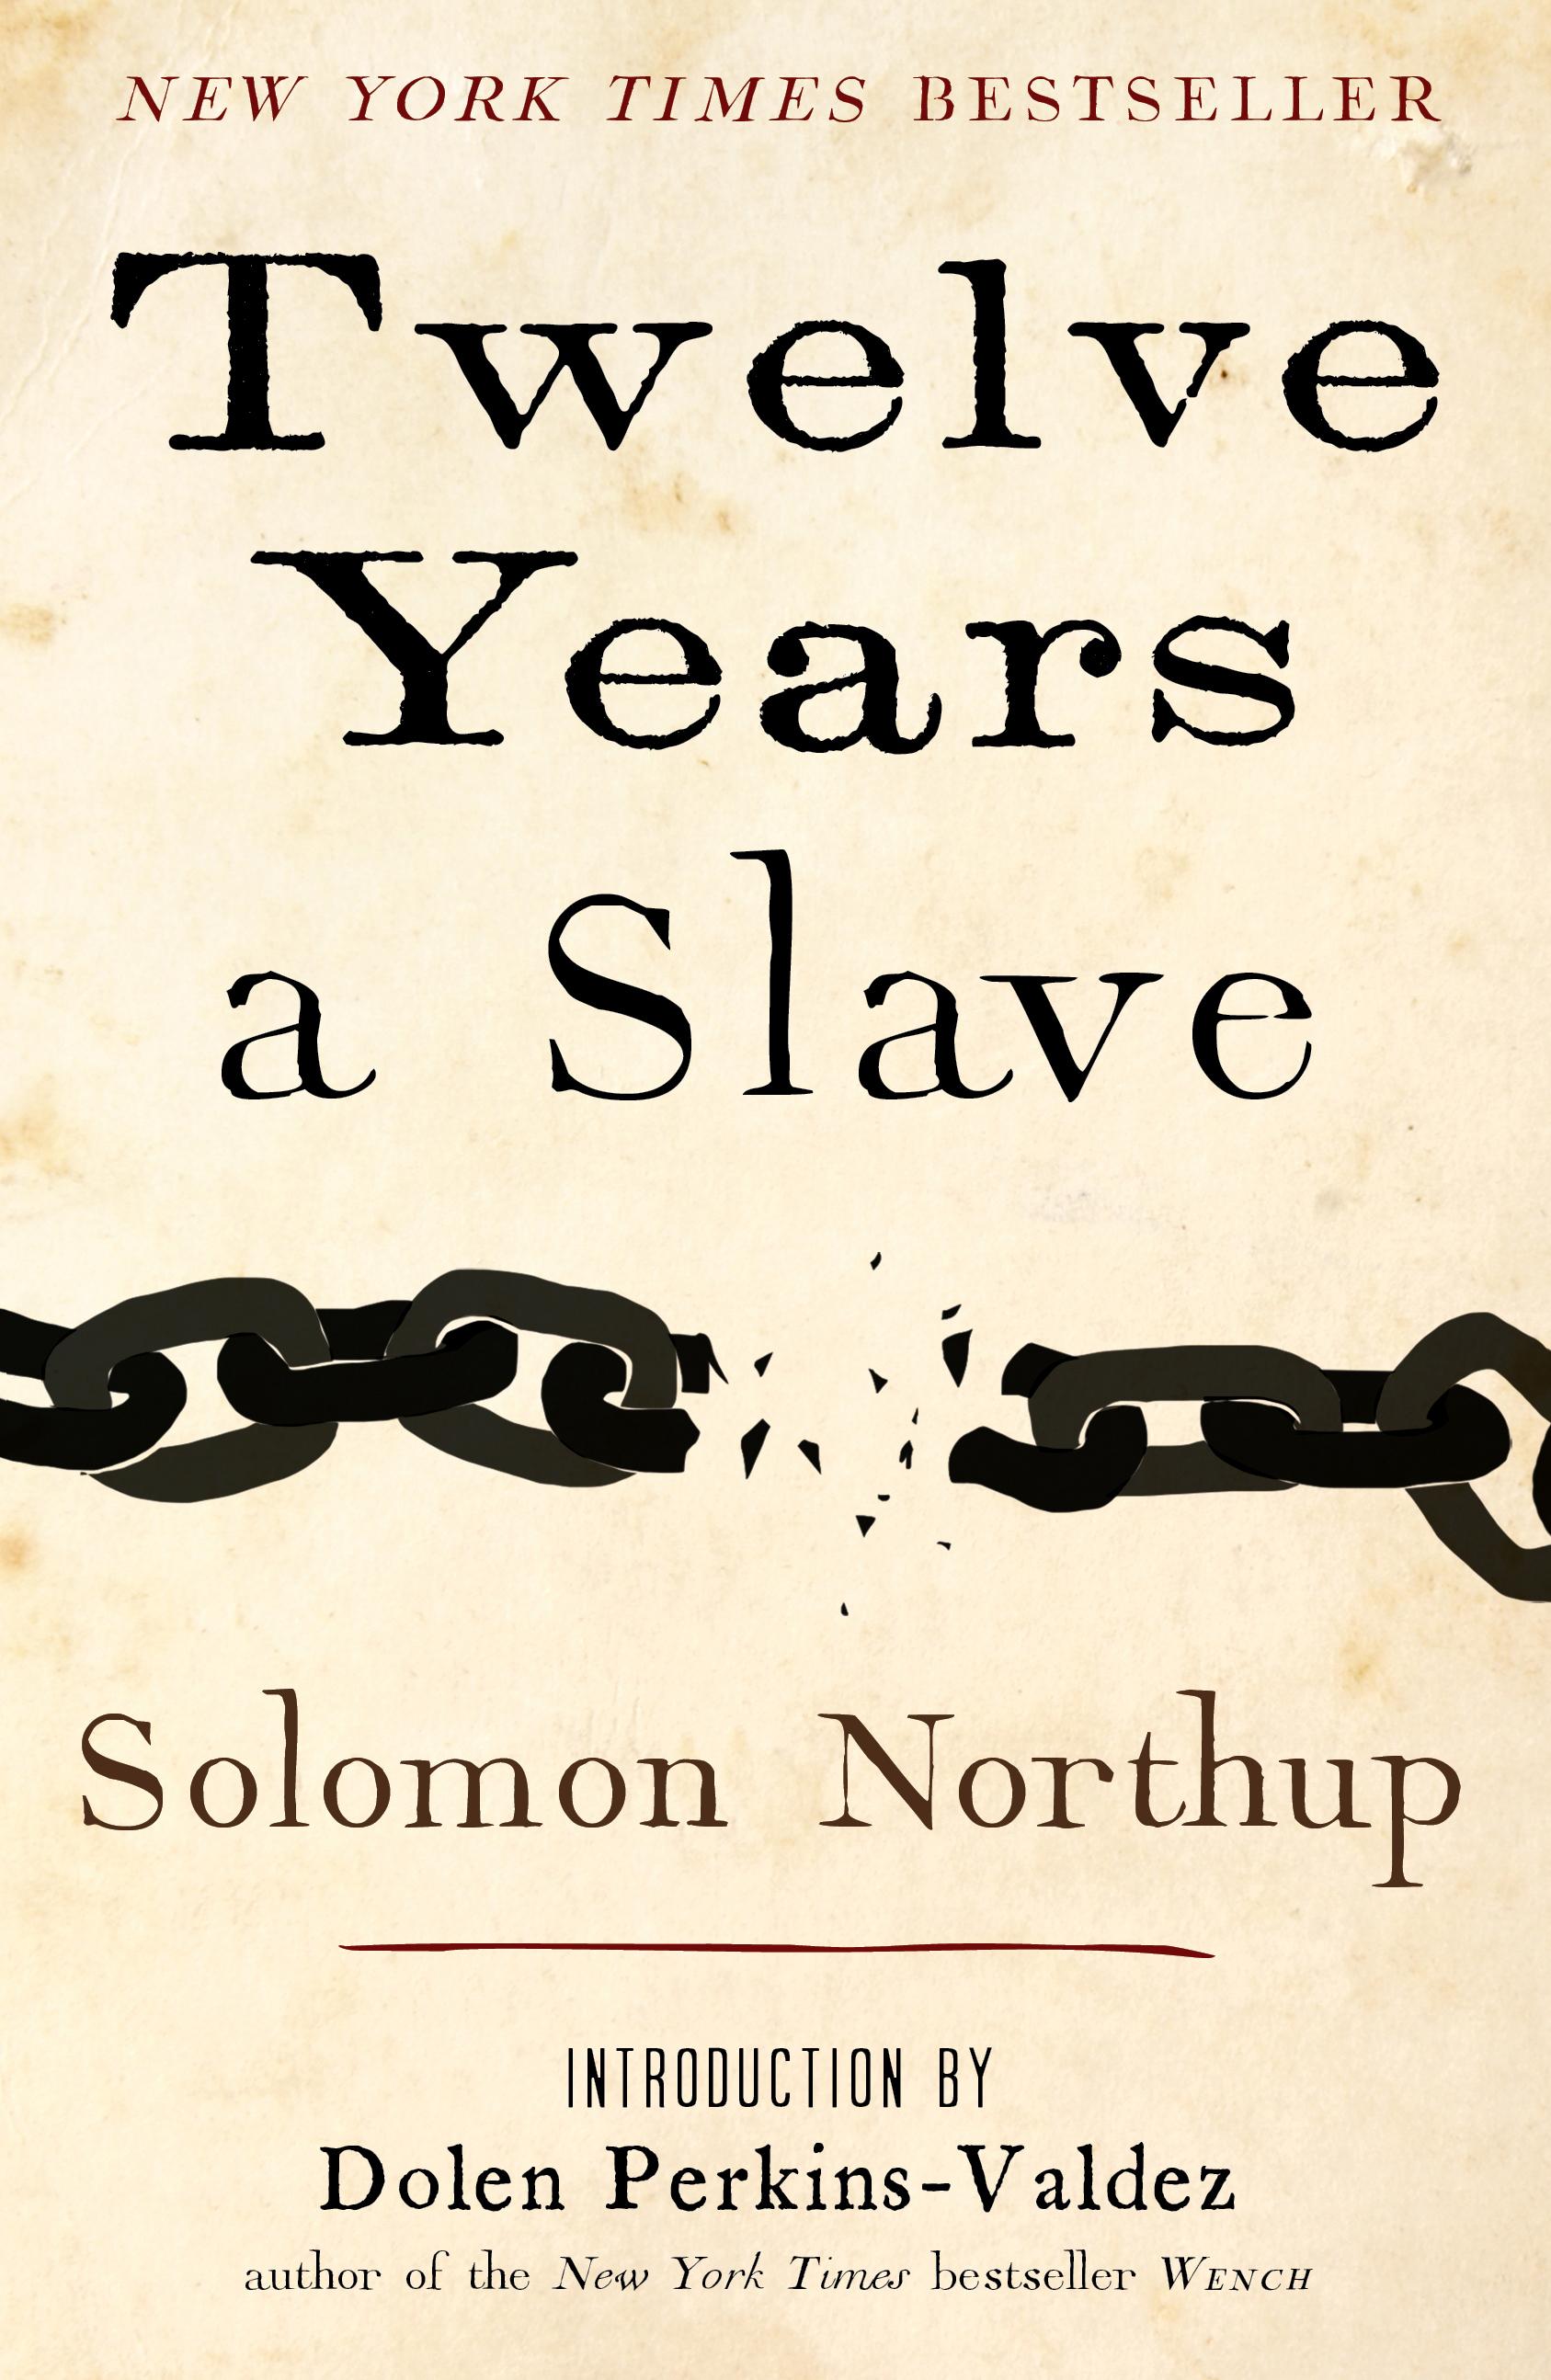 Twelve Years a Slave | Book by Solomon Northup, Dolen Perkins-Valdez |  Official Publisher Page | Simon & Schuster